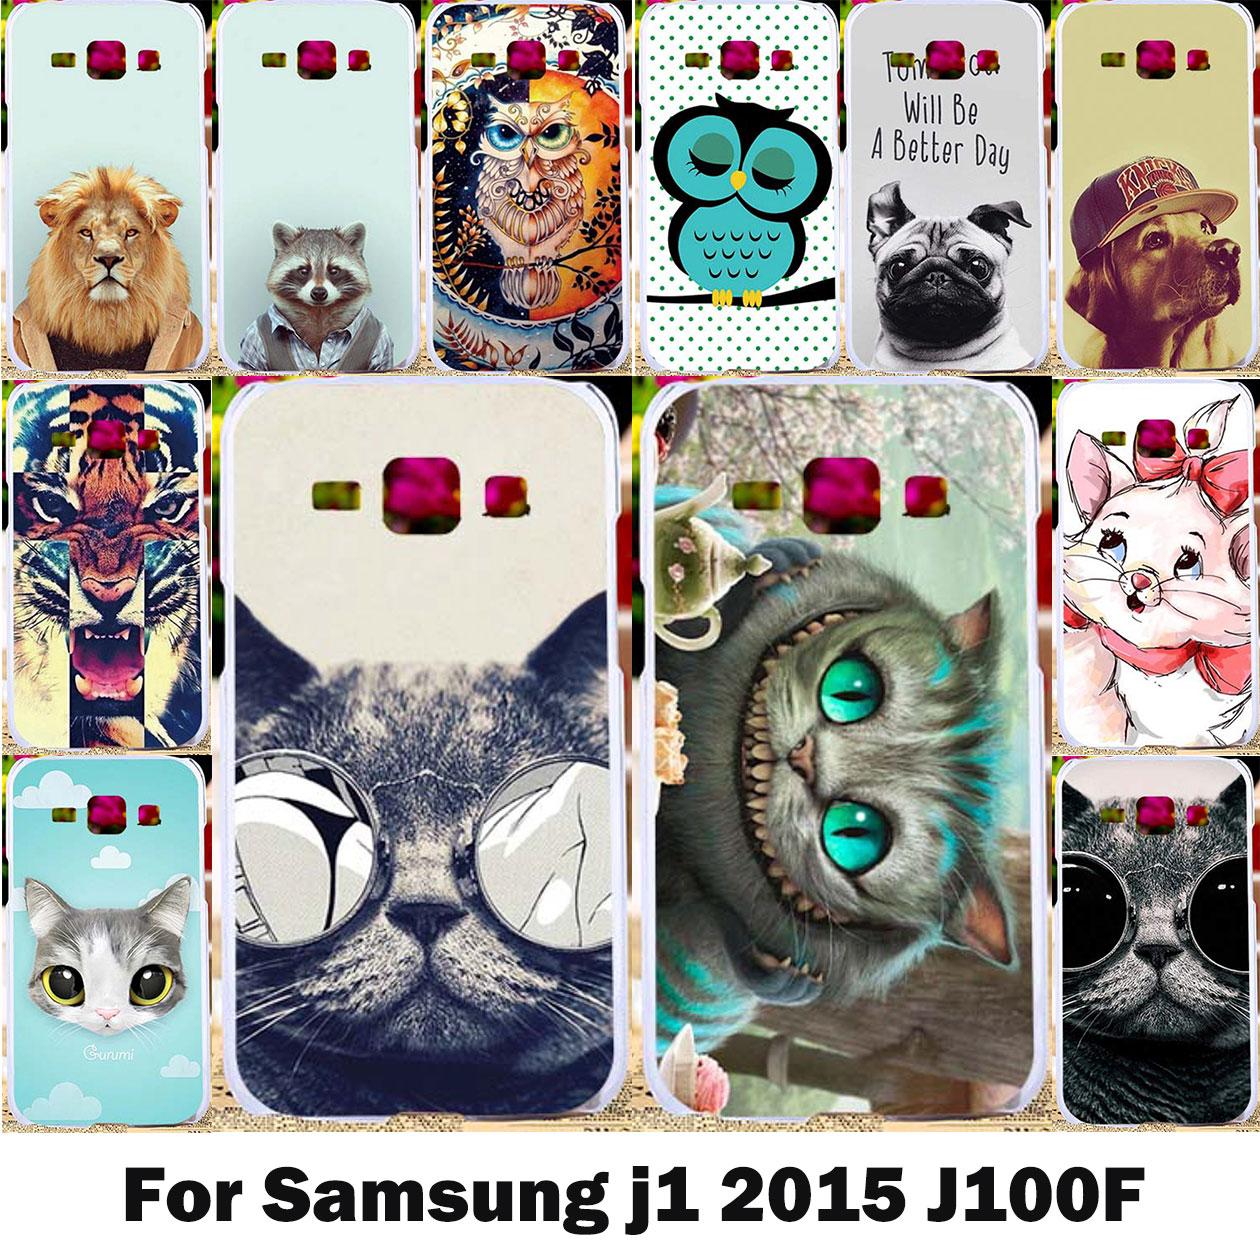 AKABEILA Cat Phone Case For Samsung Galaxy J1 2015 J100F J100FN J100H J100H/DD J100M J100MU SM-J100F J100 Hard PC Soft TPU Cover